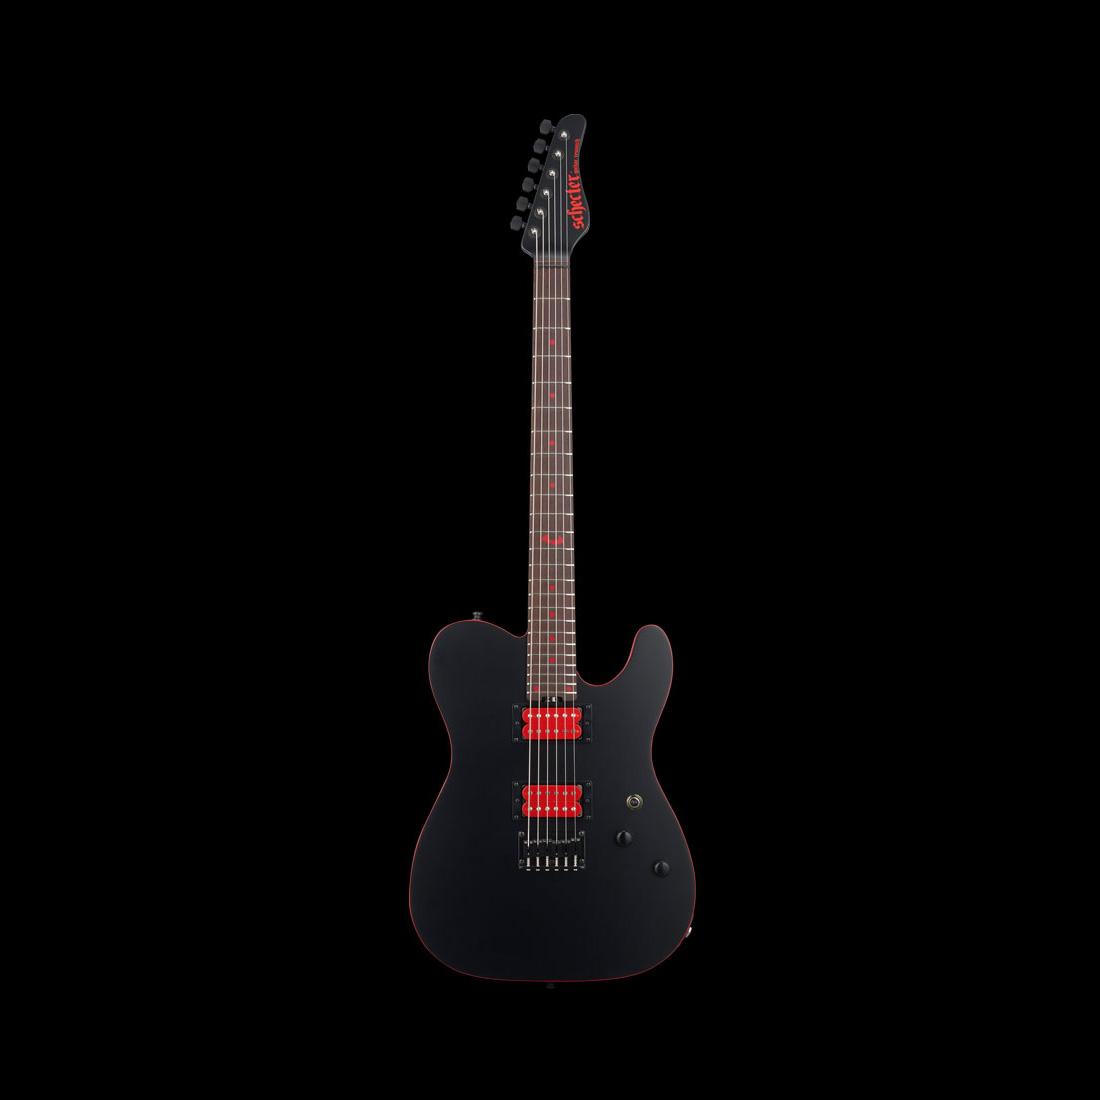 Schecter / AC-SM-SH-SIG Mat Black シェクター エレキギター SHOW-HATEシグネイチヤー 《受注生産:予約受付中》